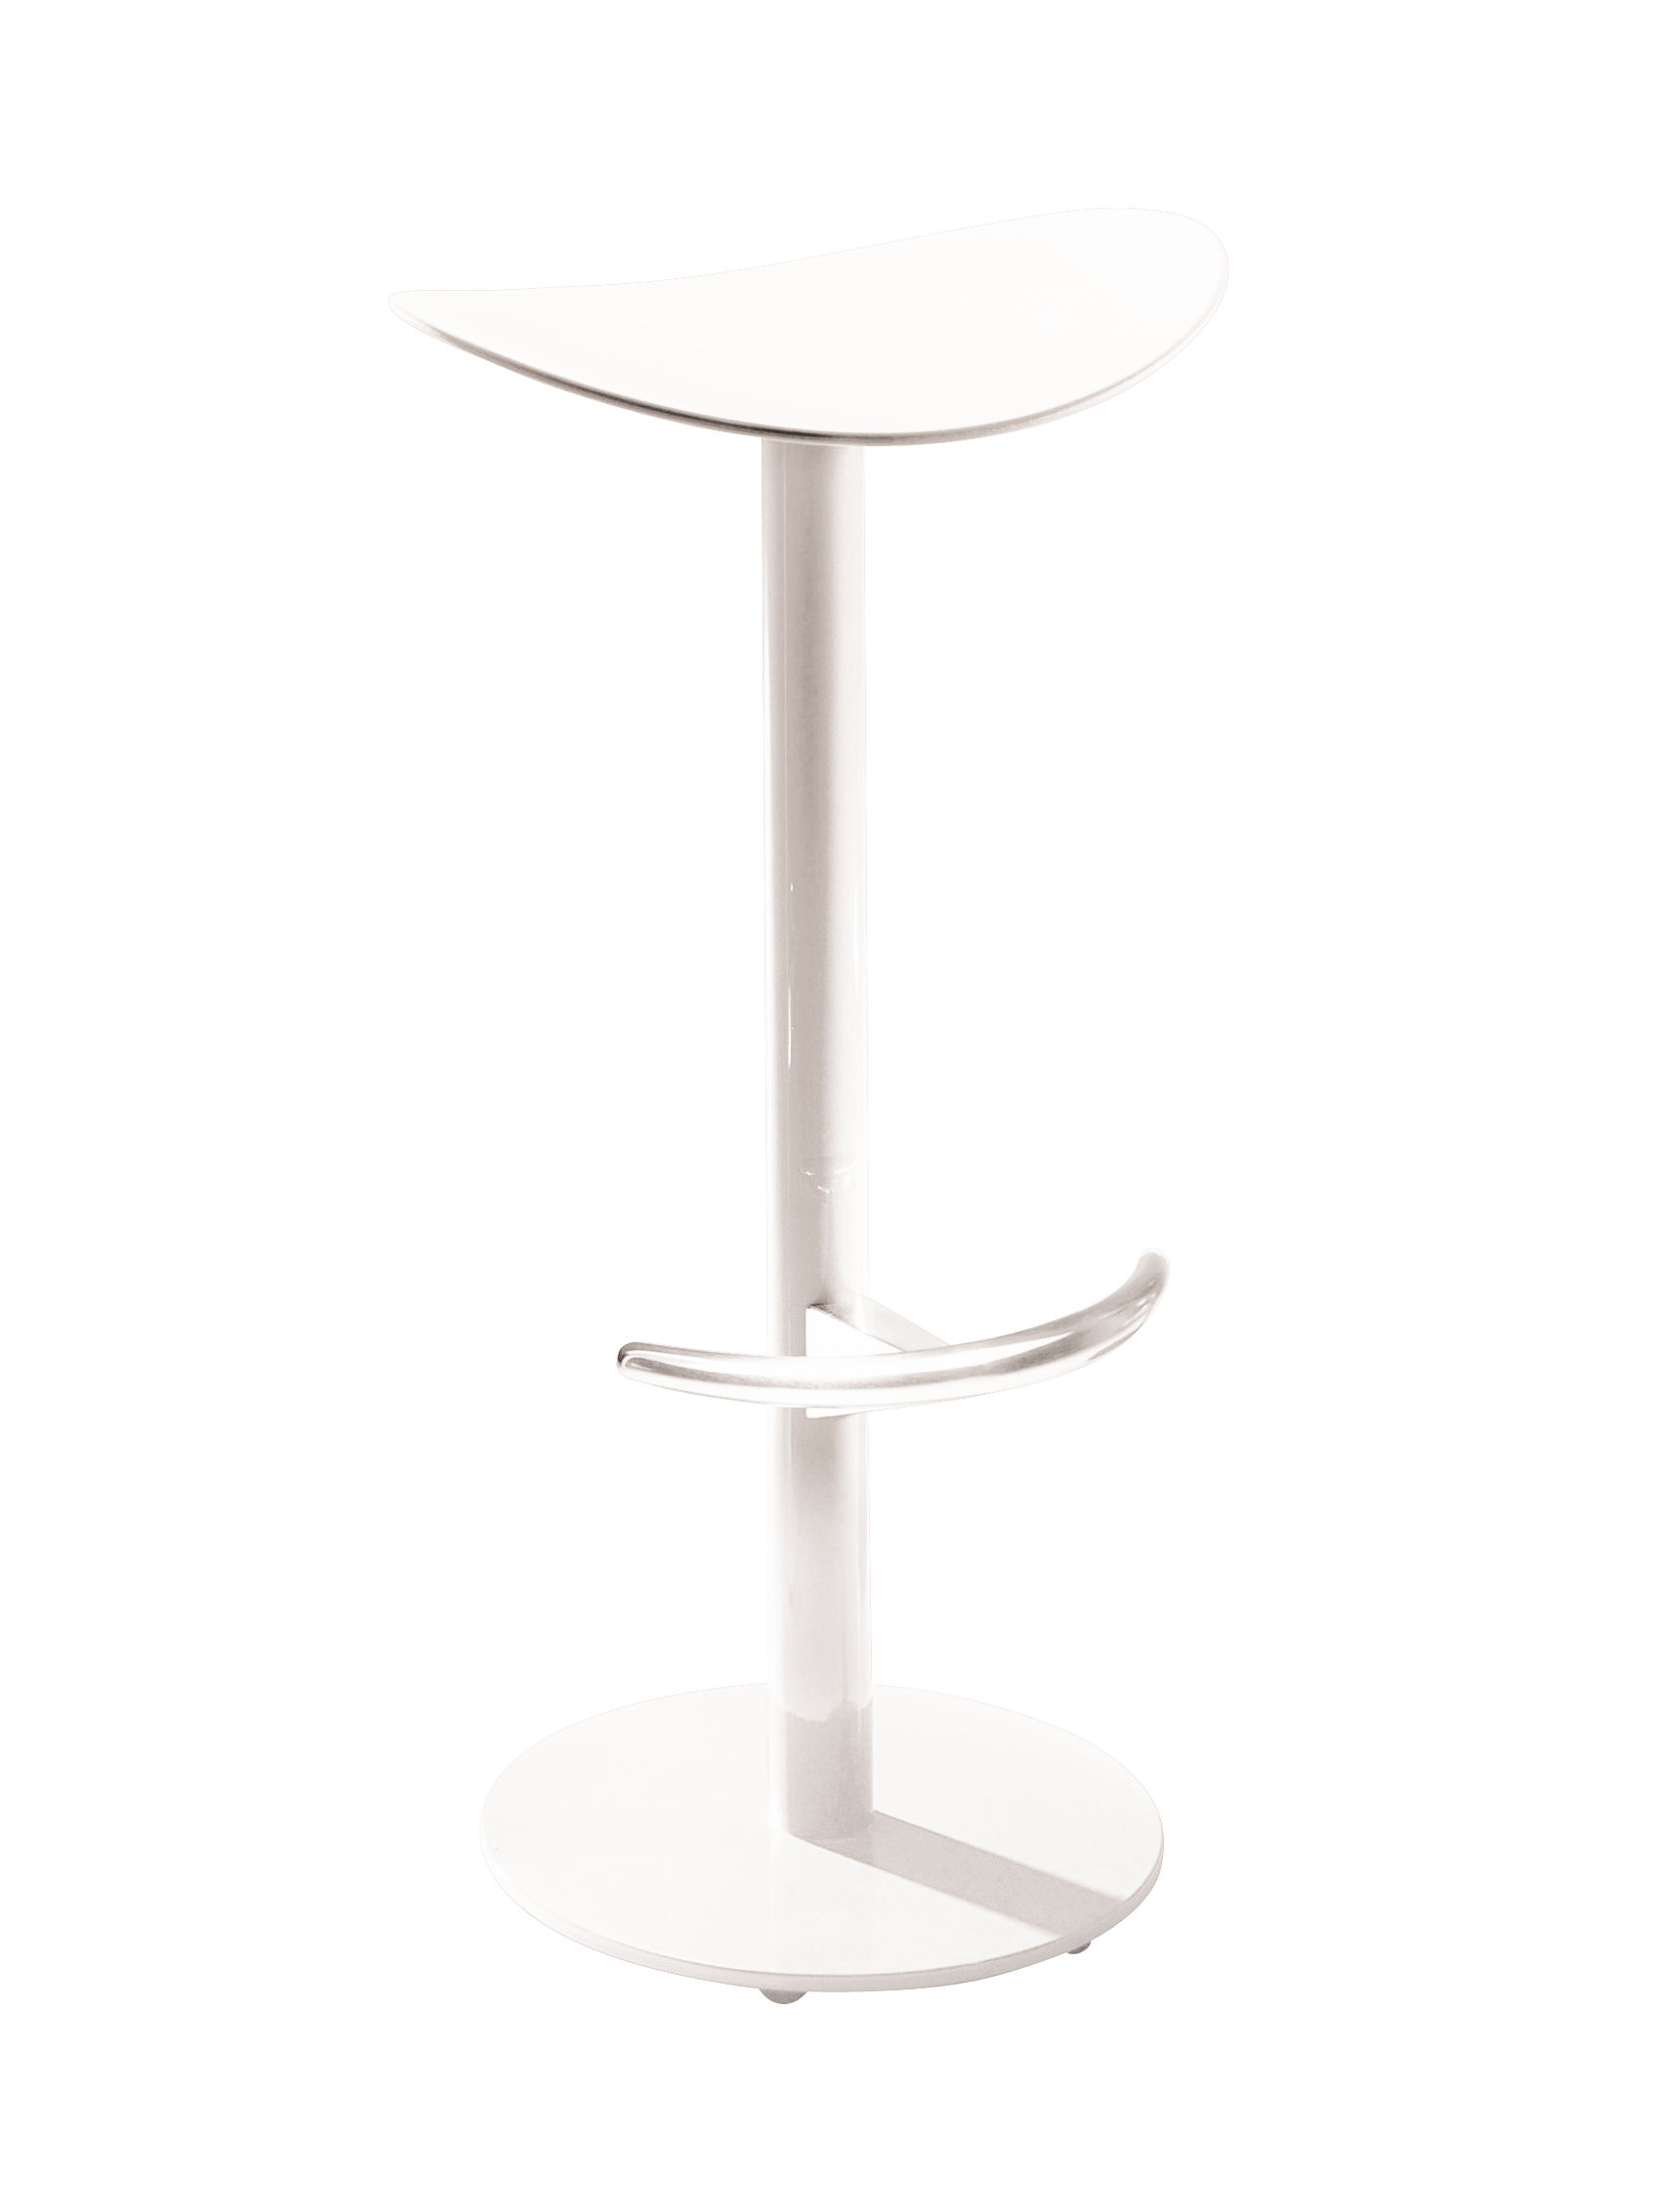 Möbel - Barhocker - Coma Barhocker H 69 cm - Enea - Weiß - lackierter Stahl, Polypropylen